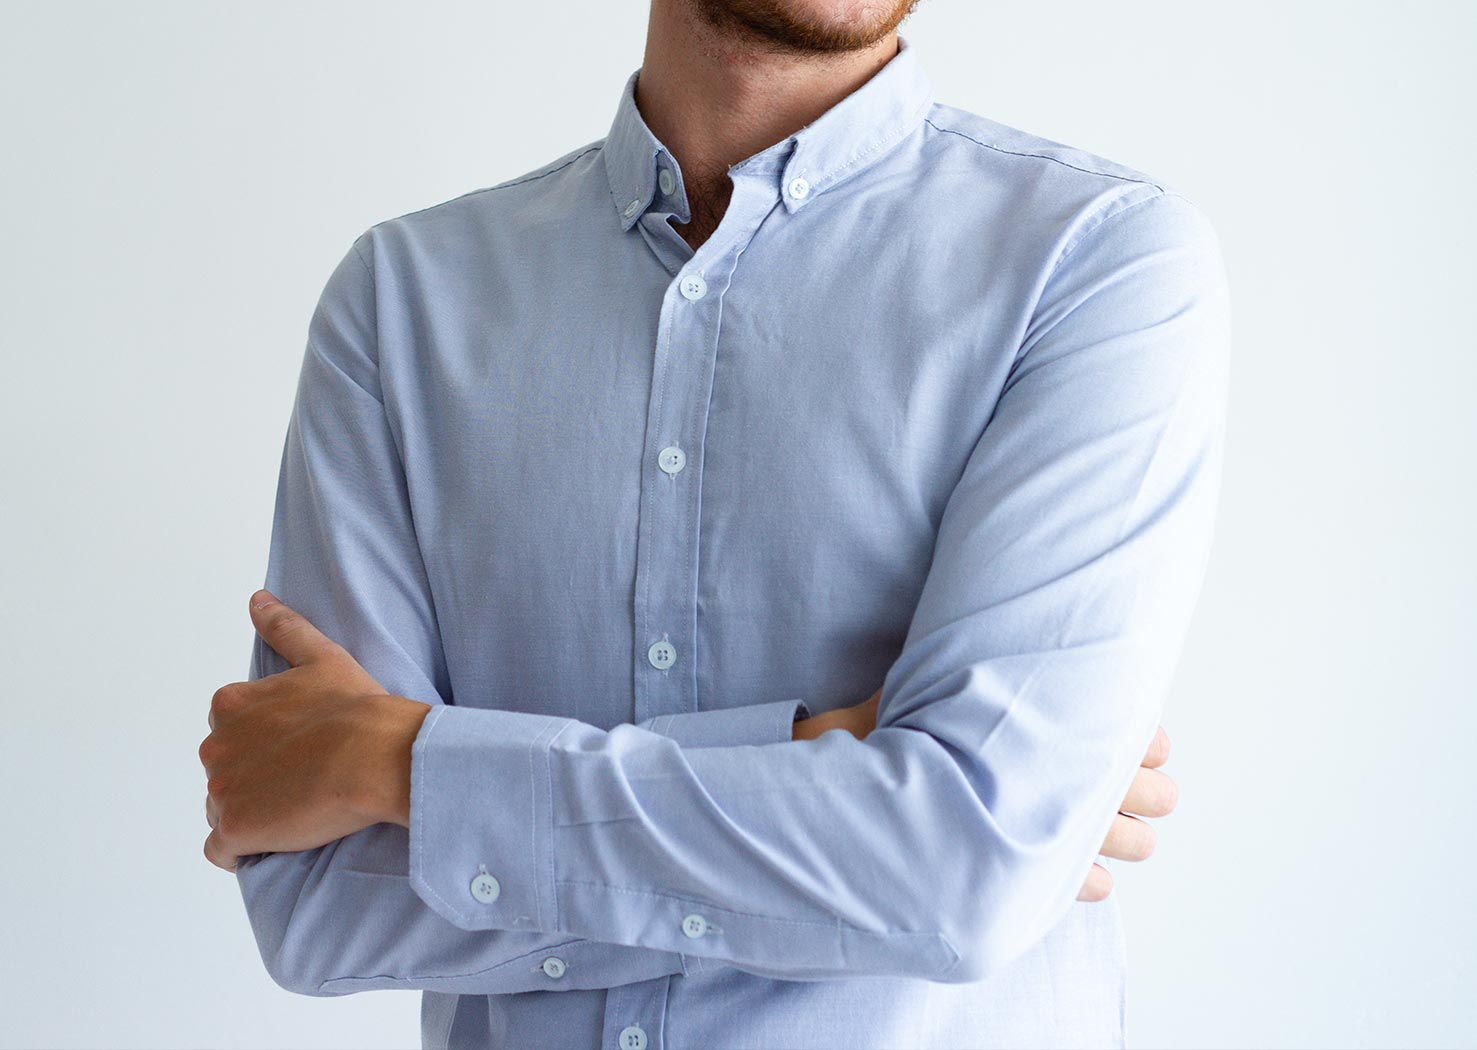 Custom Clothing - What Can You Customize? Dress Shirt